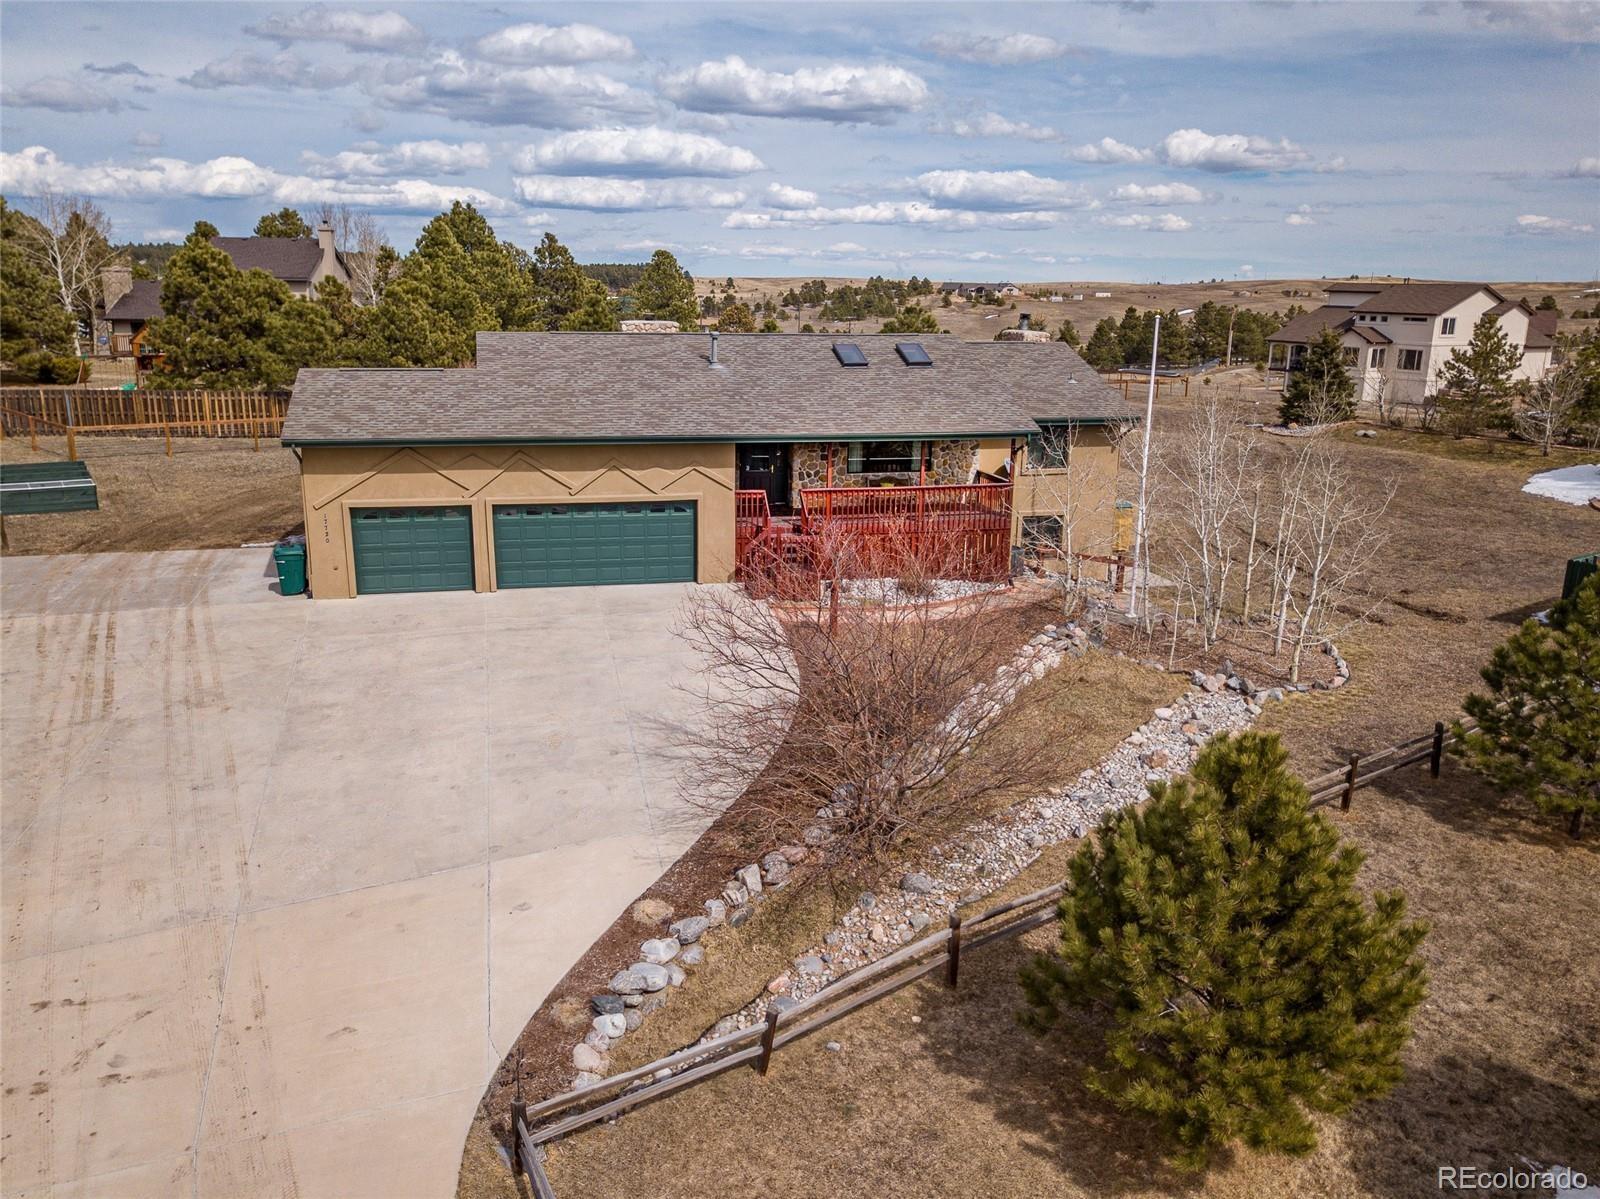 MLS# 9205685 - 1 - 17720 Pioneer Crossing, Colorado Springs, CO 80908